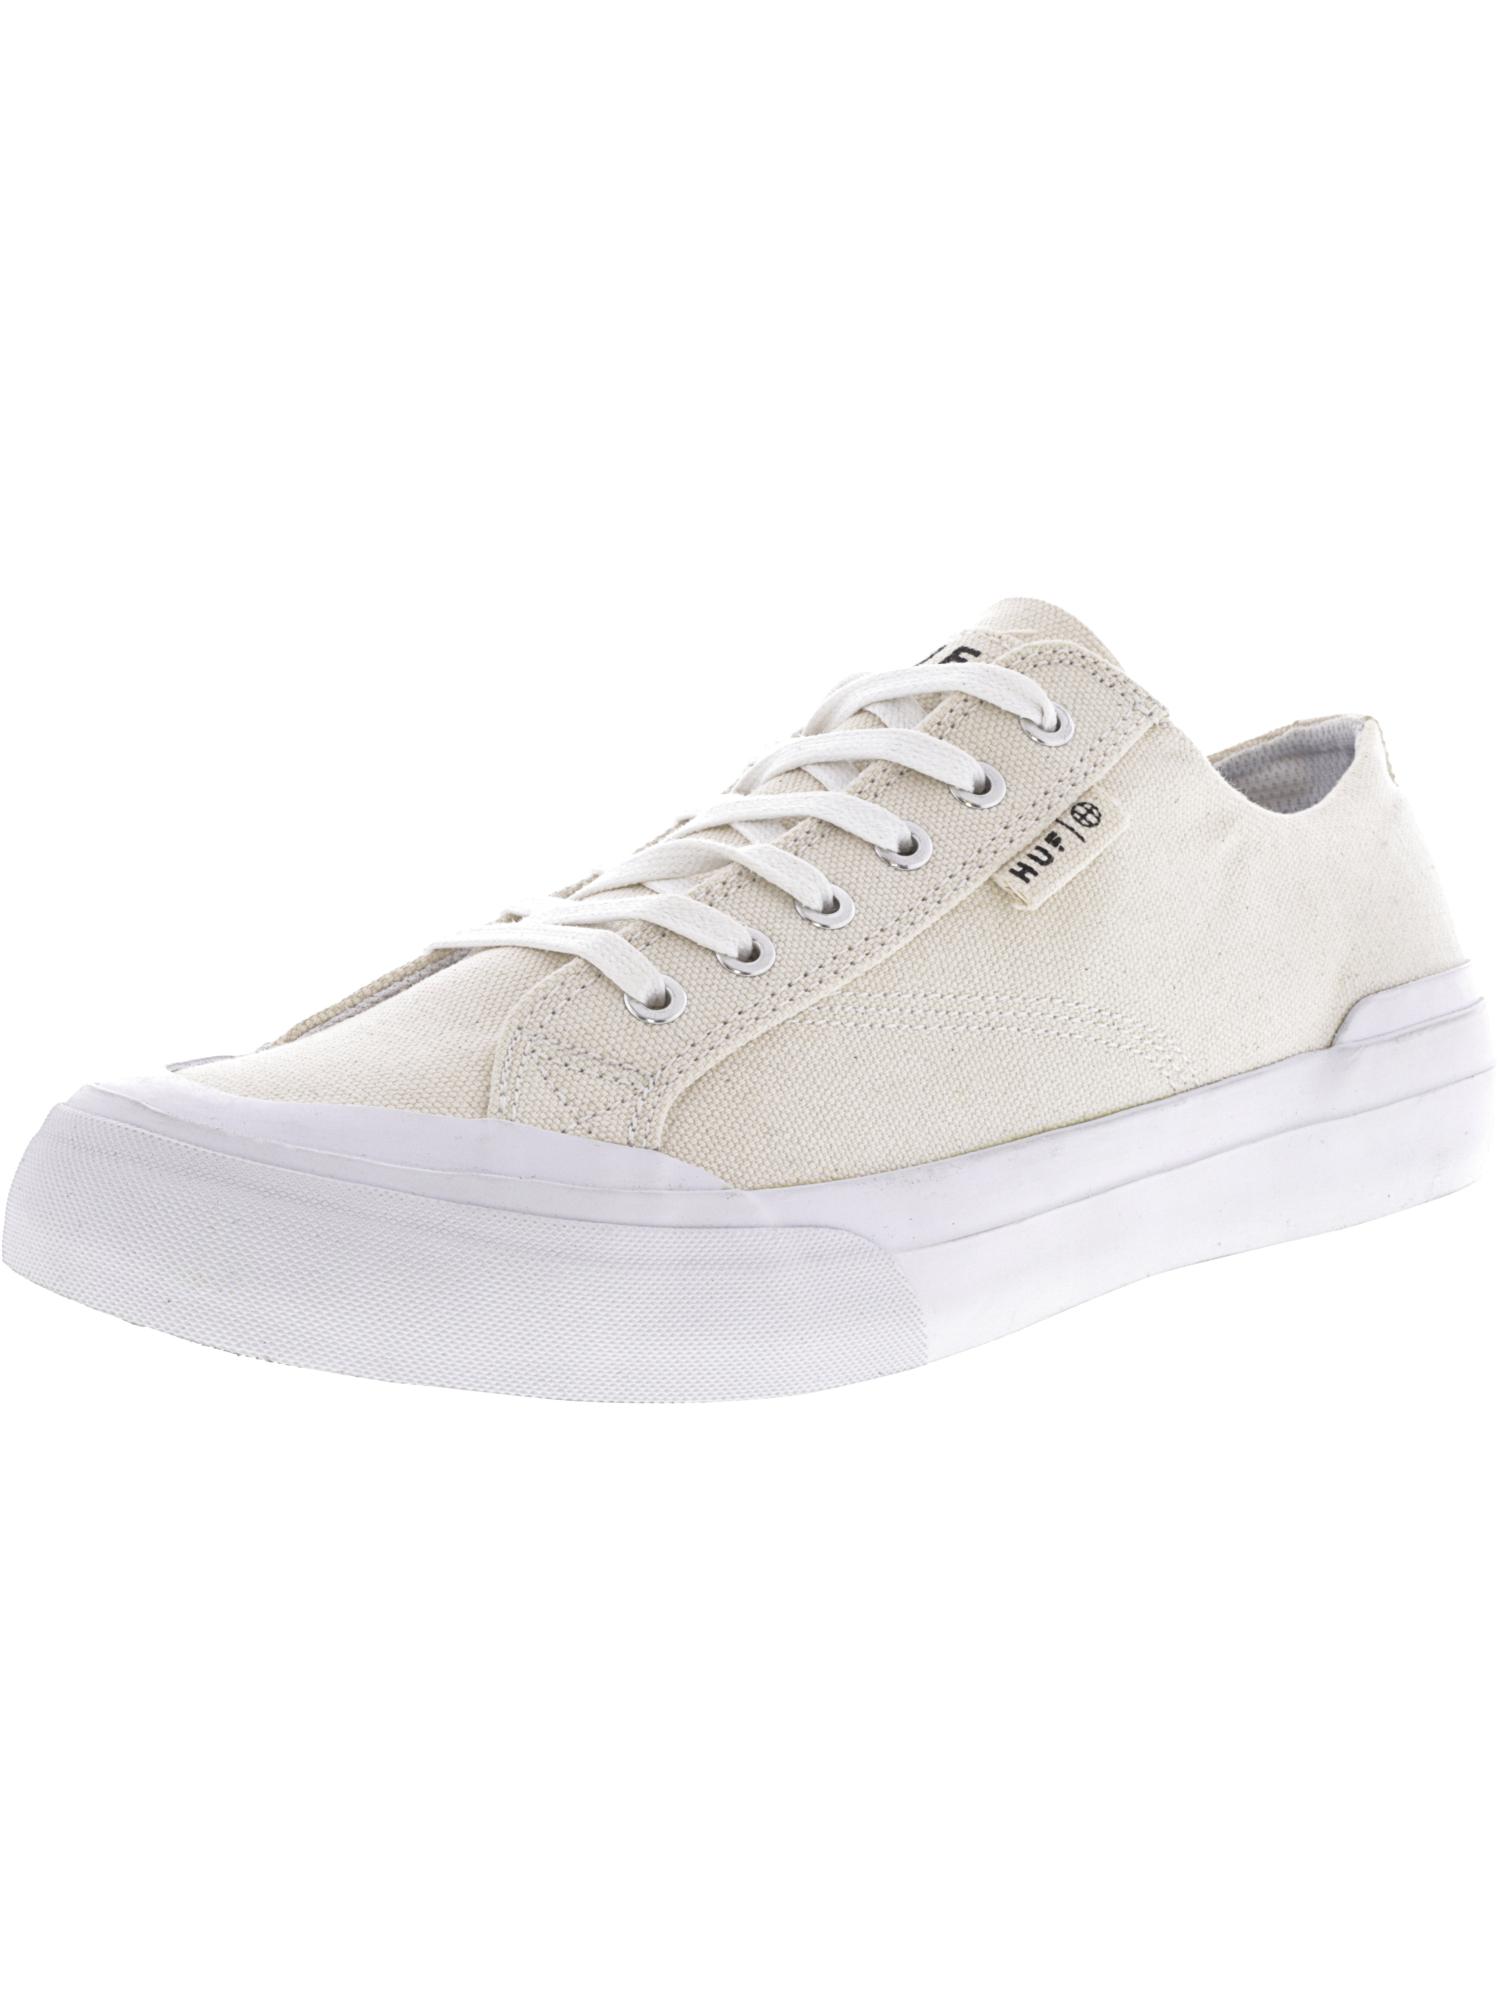 Huf uomini classico lo caviglia alta tela tela alta skateboard scarpa 017886